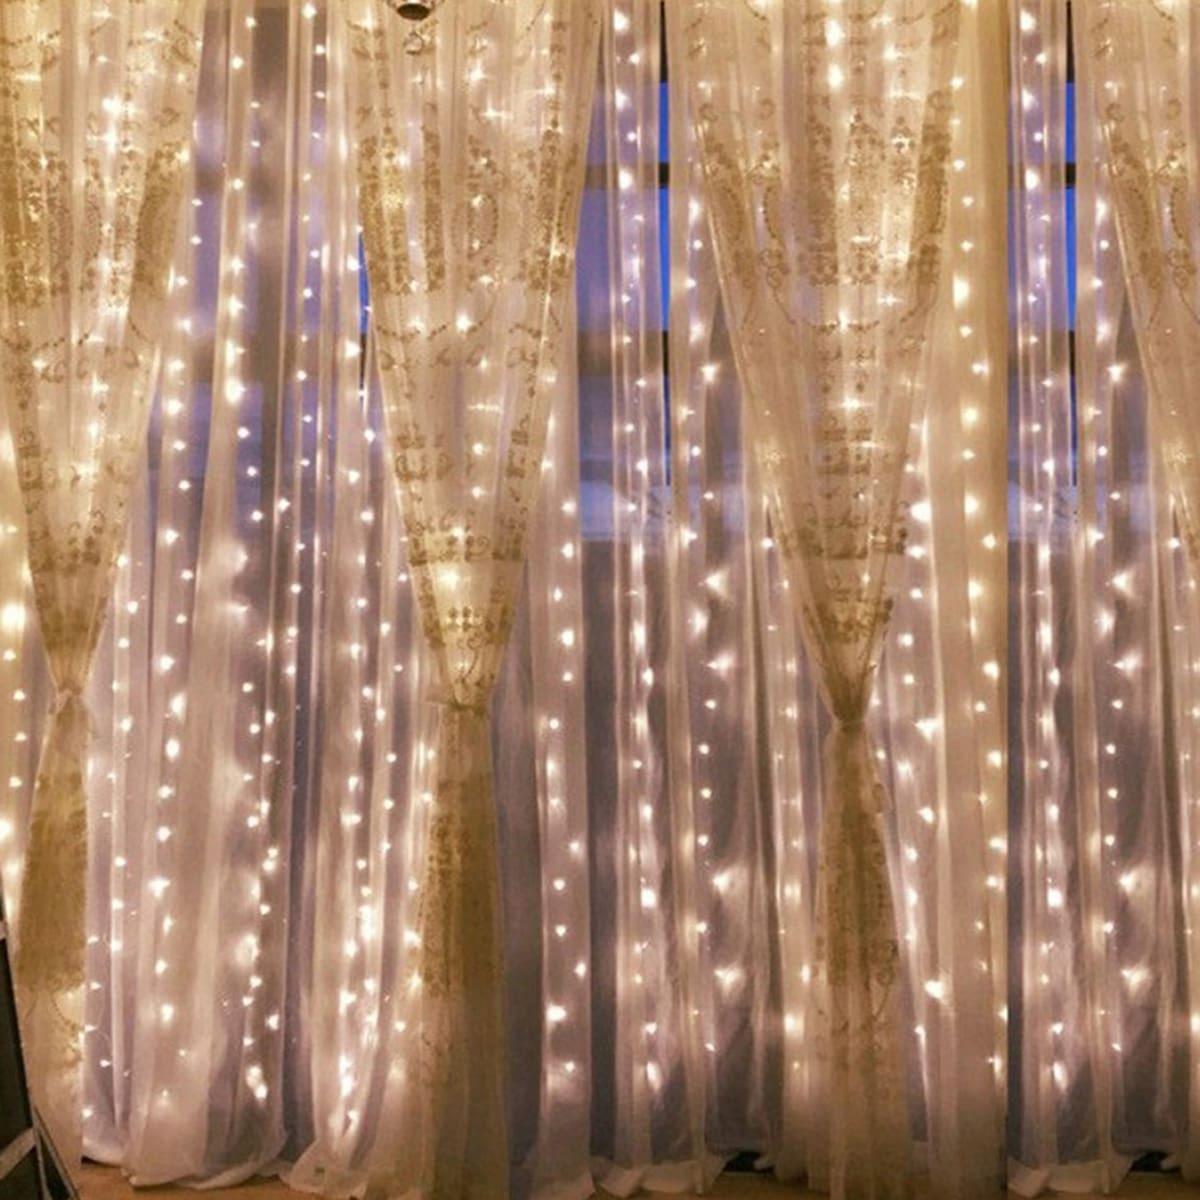 1 String Blub Light met 20 kleine lampen